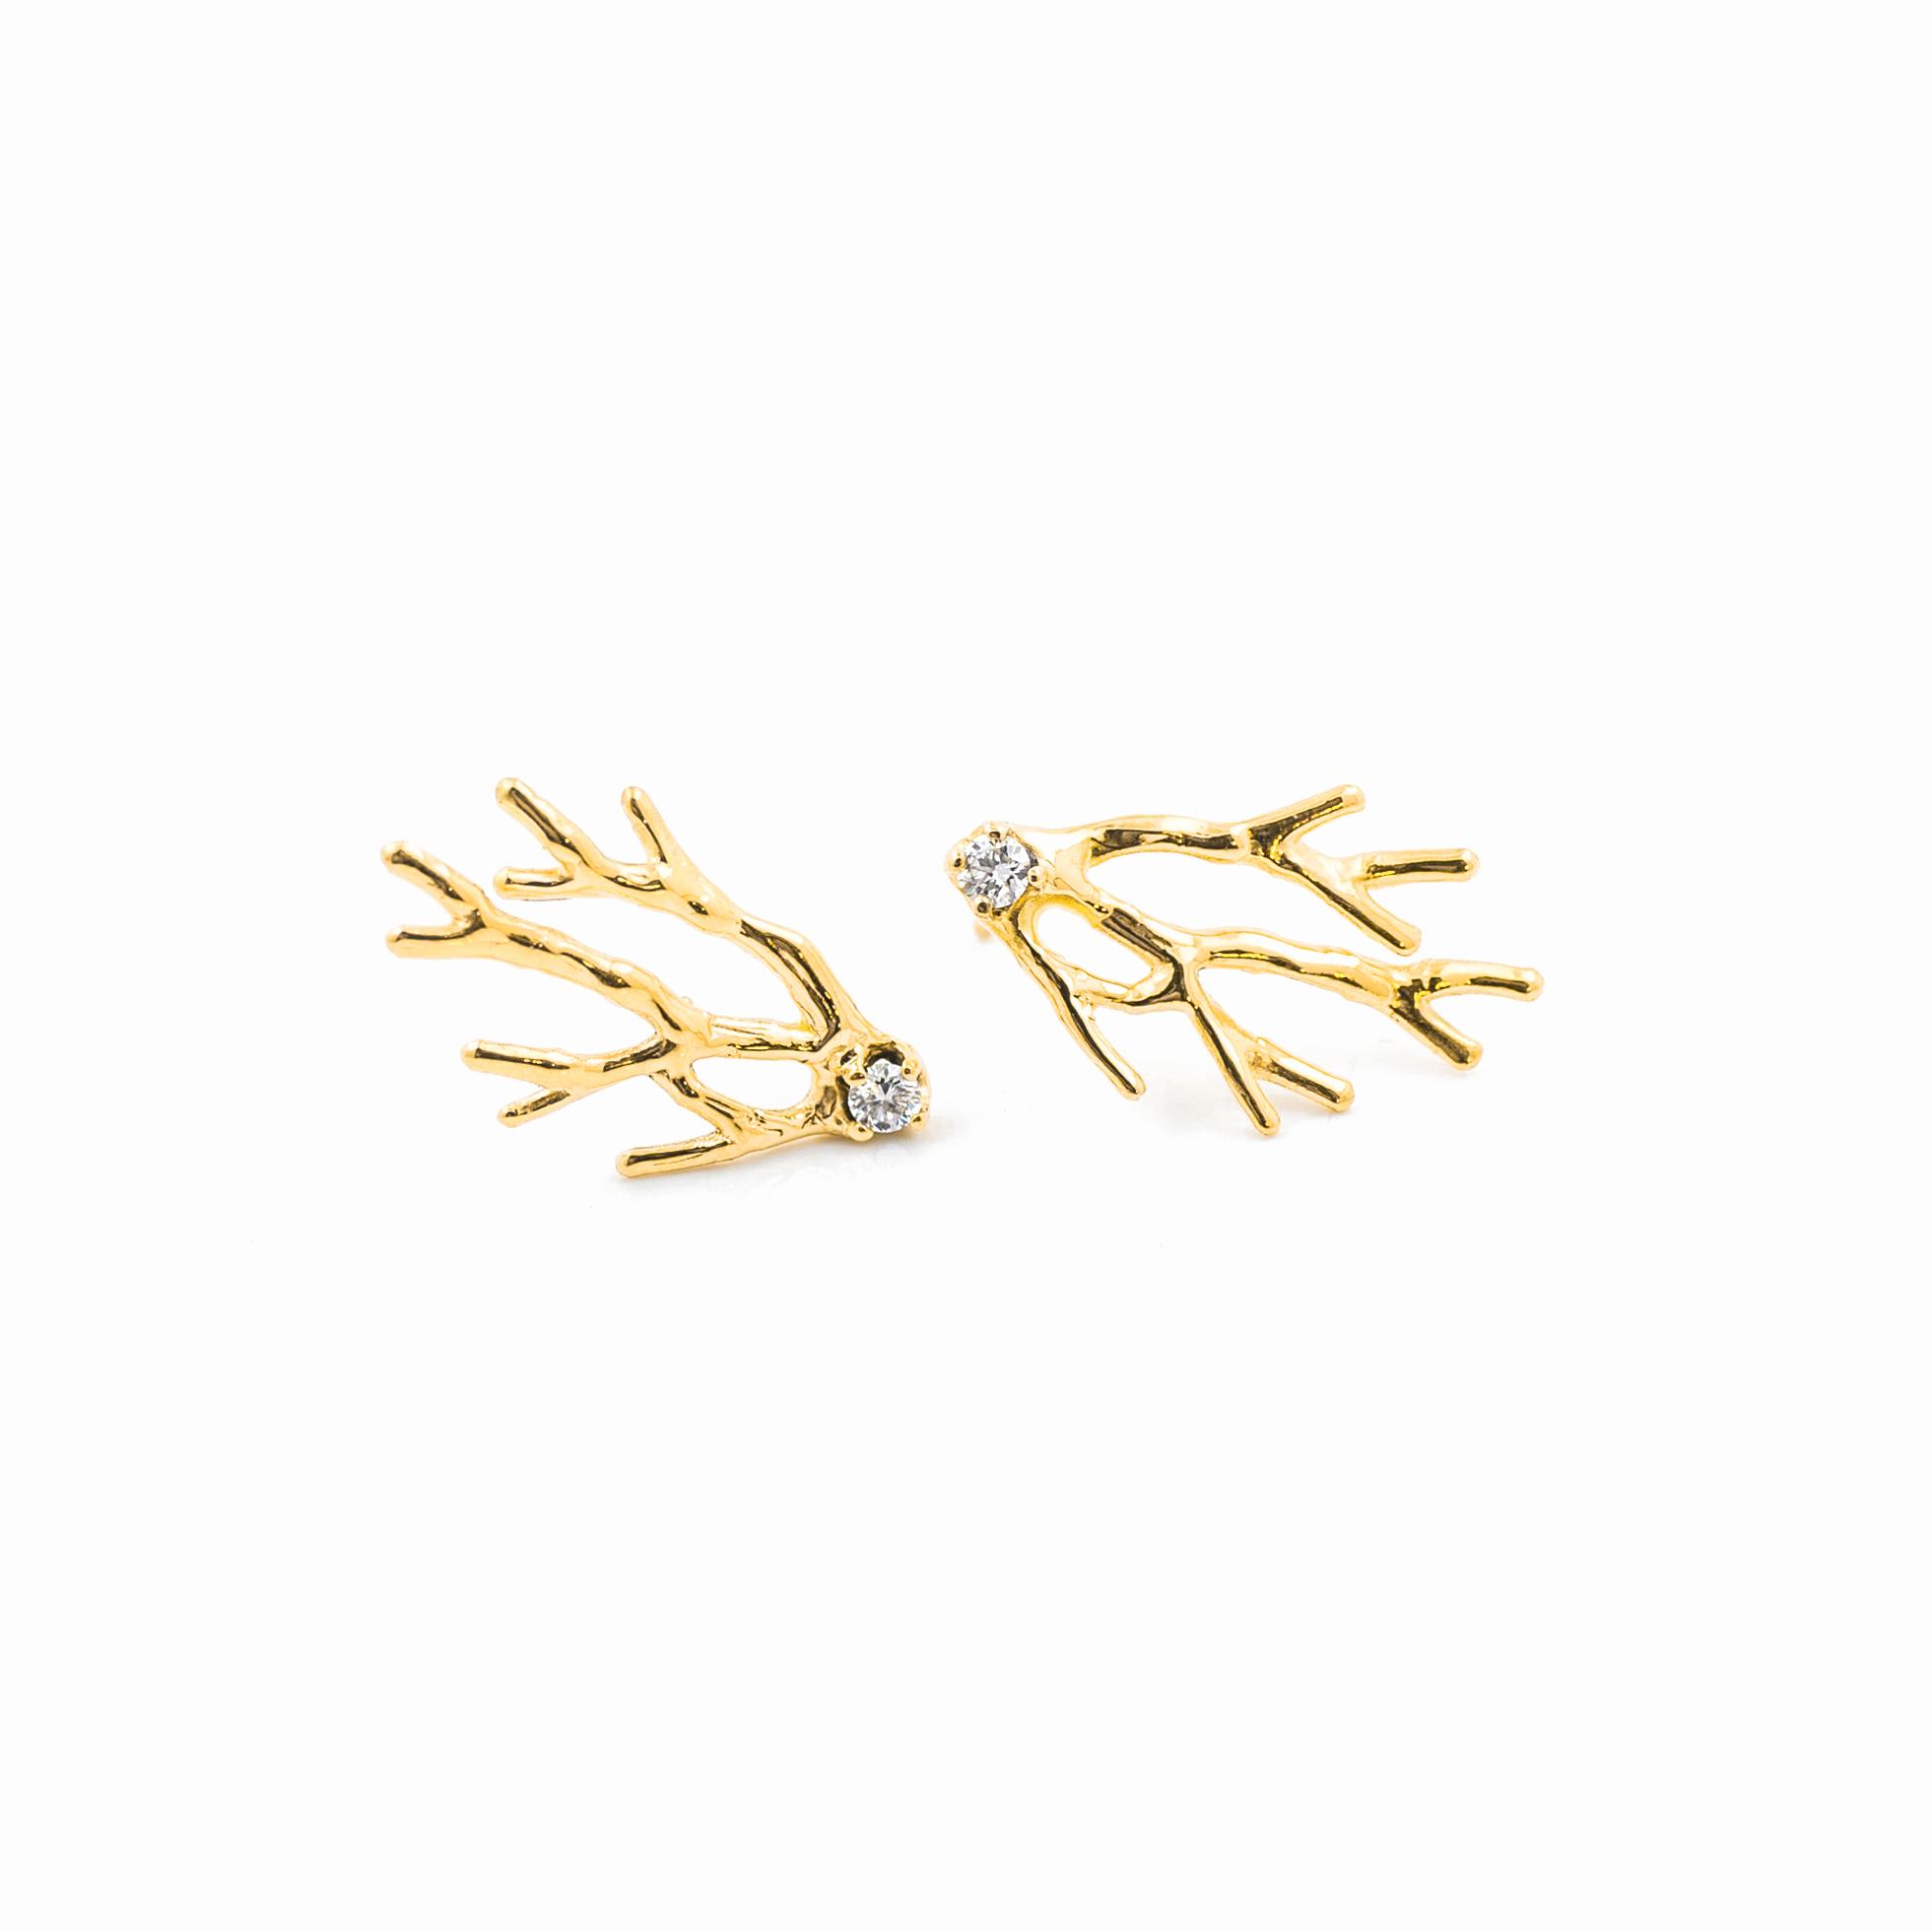 Dendrite Earrings: 18ct yellow gold, brilliant white diamonds